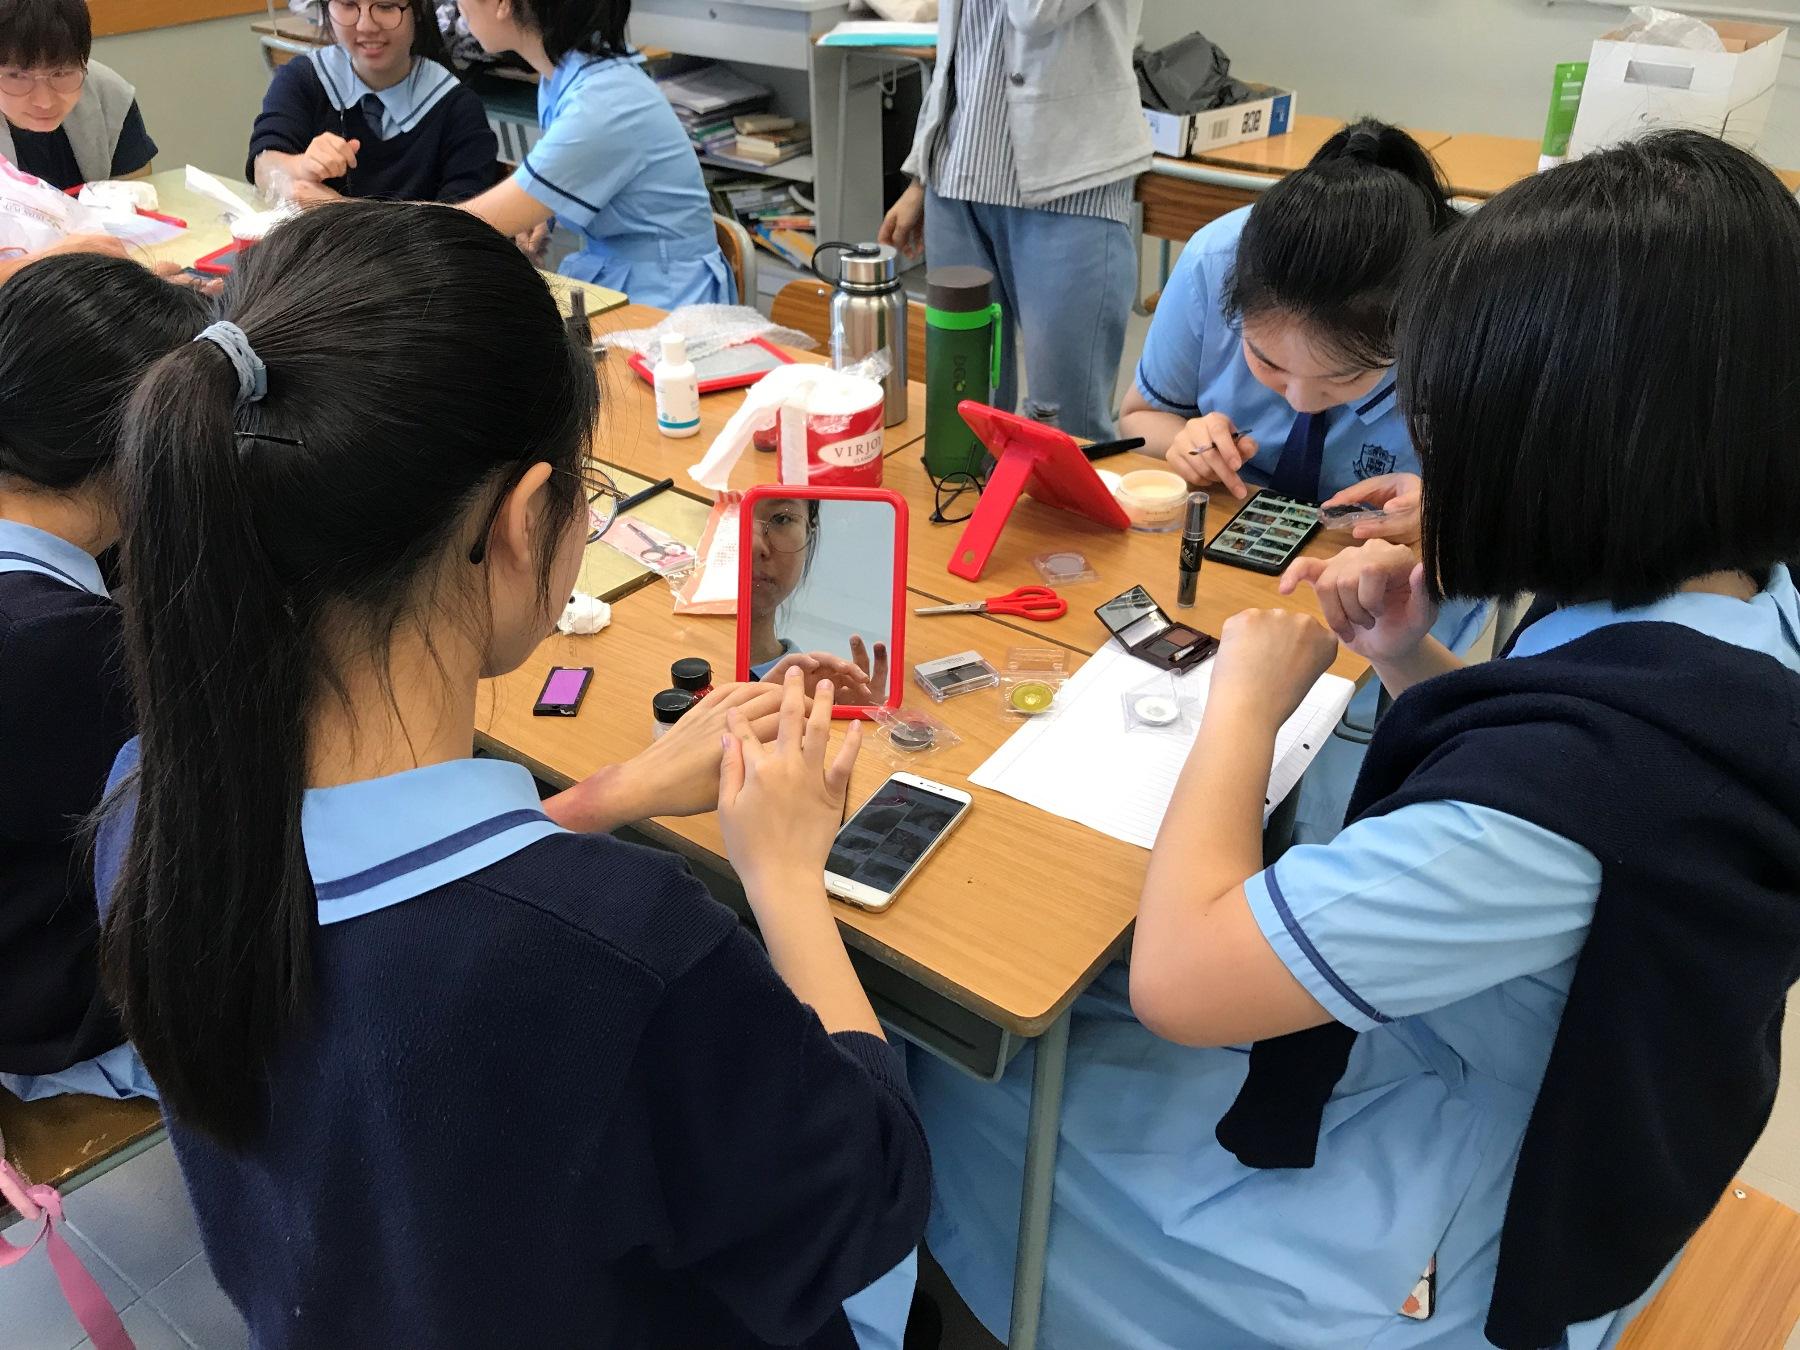 http://npc.edu.hk/sites/default/files/img_3837.jpg